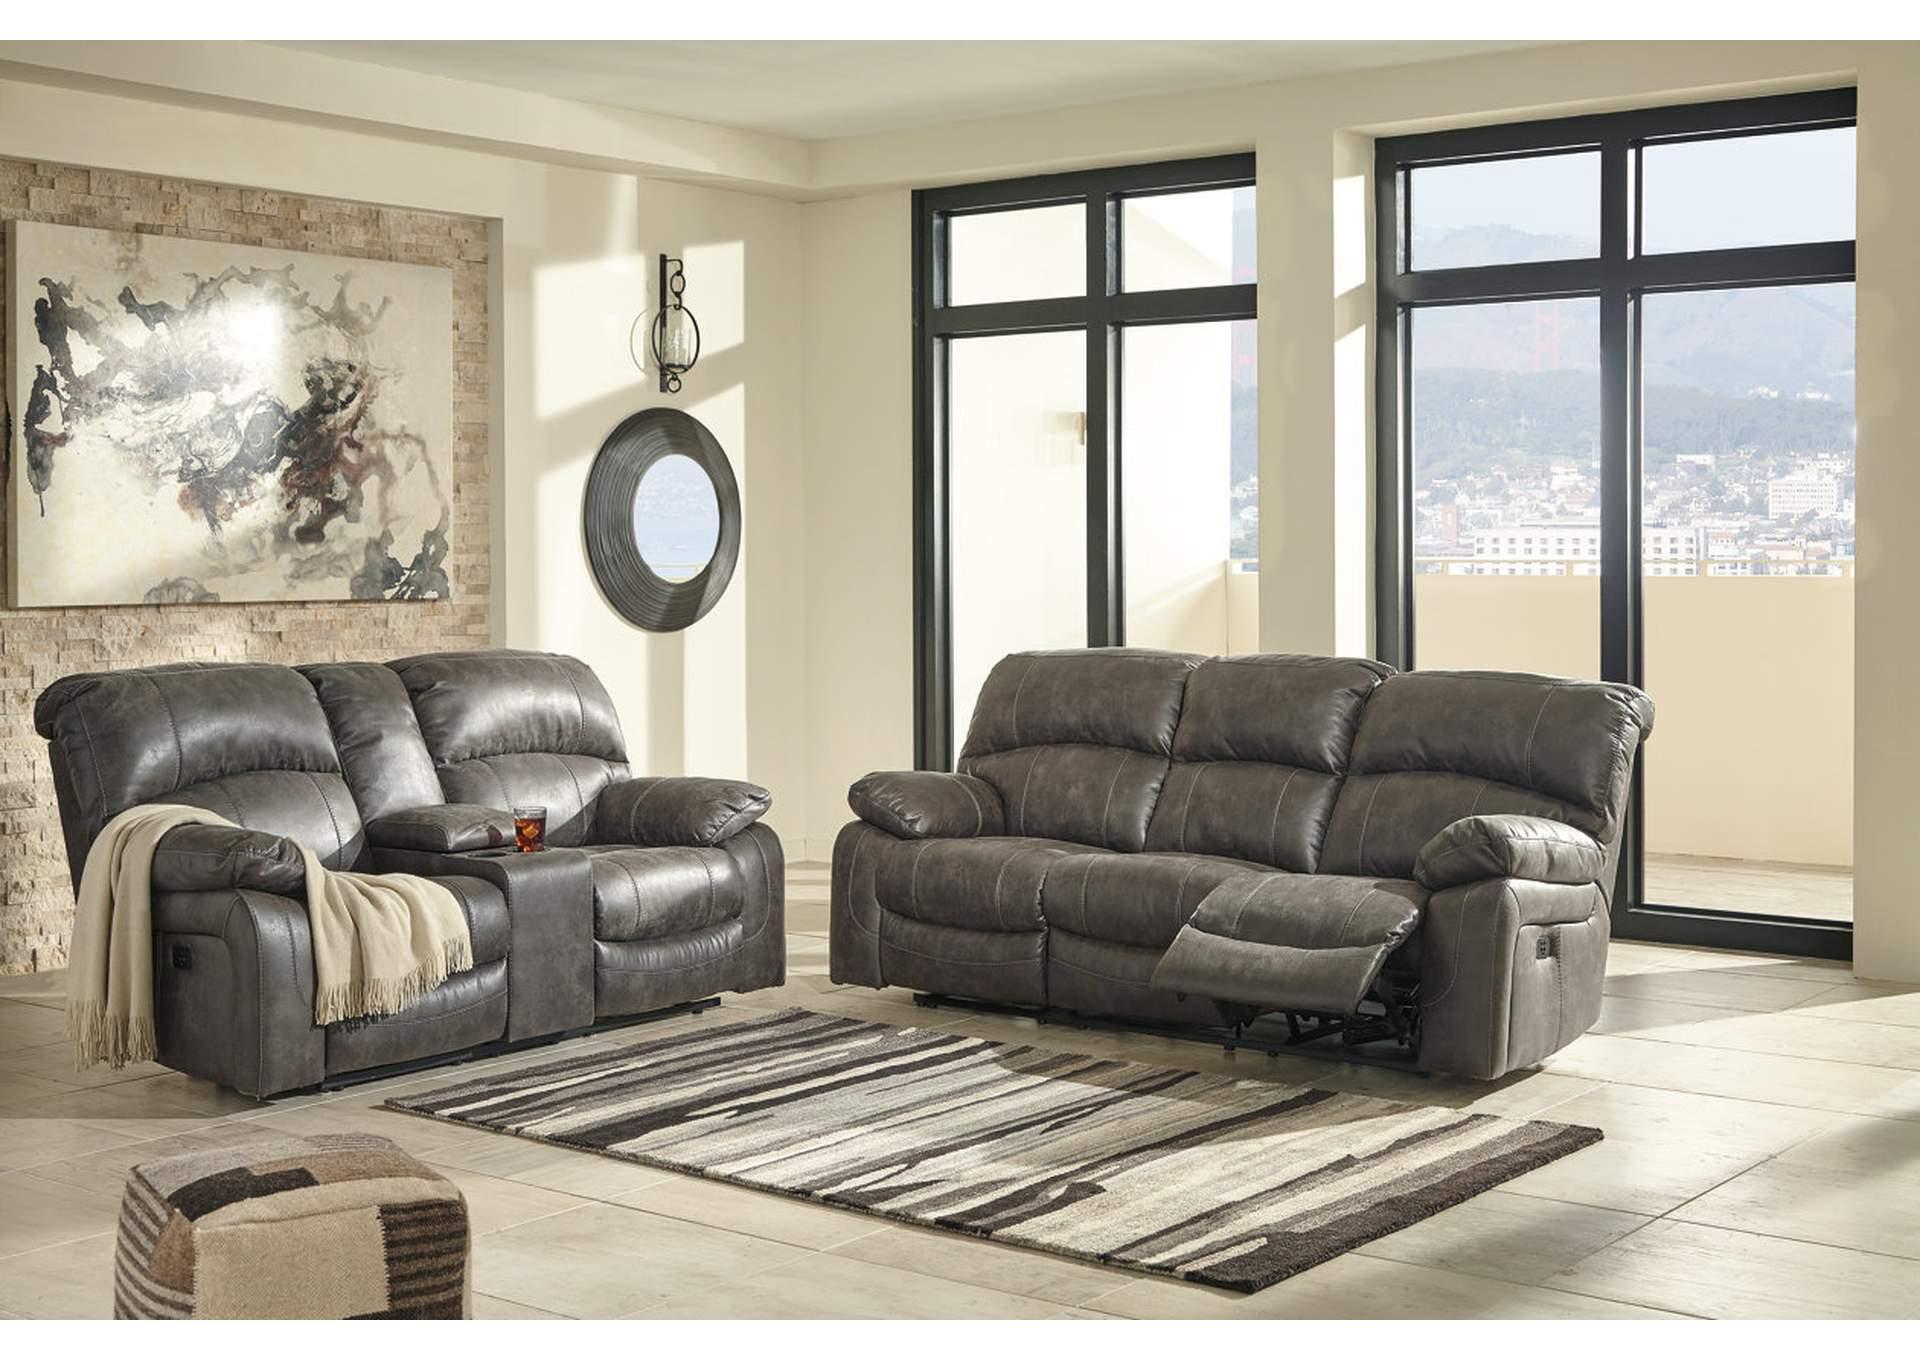 Harlem Furniture Dunwell Steel Power Reclining Sofa Loveseat